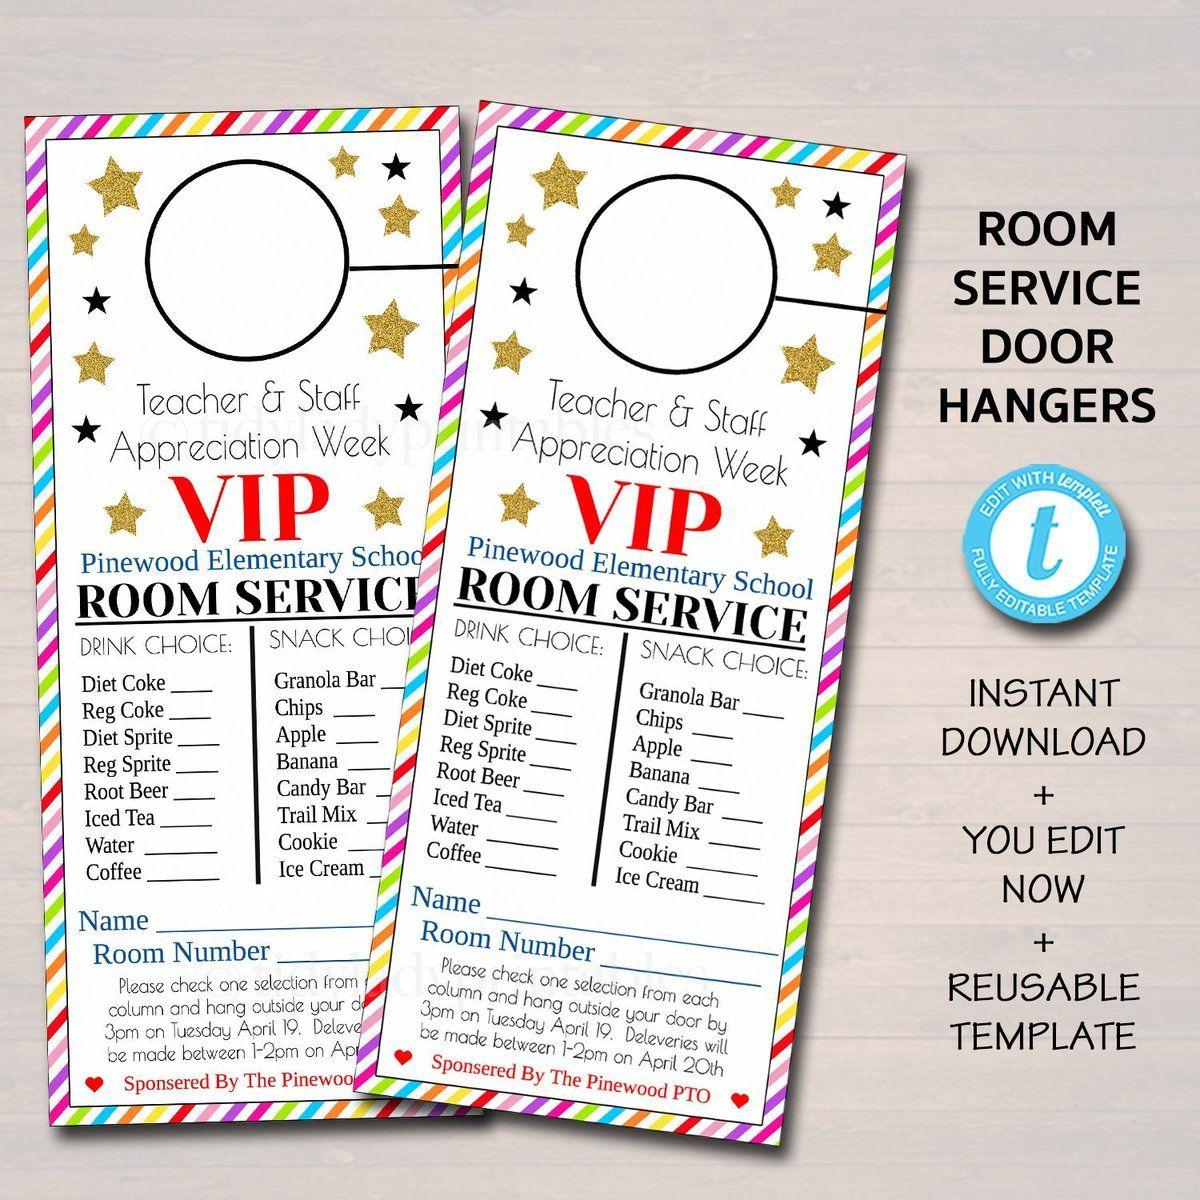 EDITABLE Room Service Door Hanger, INSTANT DOWNLOAD, Teacher and Staff Appreciation Ideas, Printable Editable Thank You Tags, School Pto Pta #employeeappreciationideas